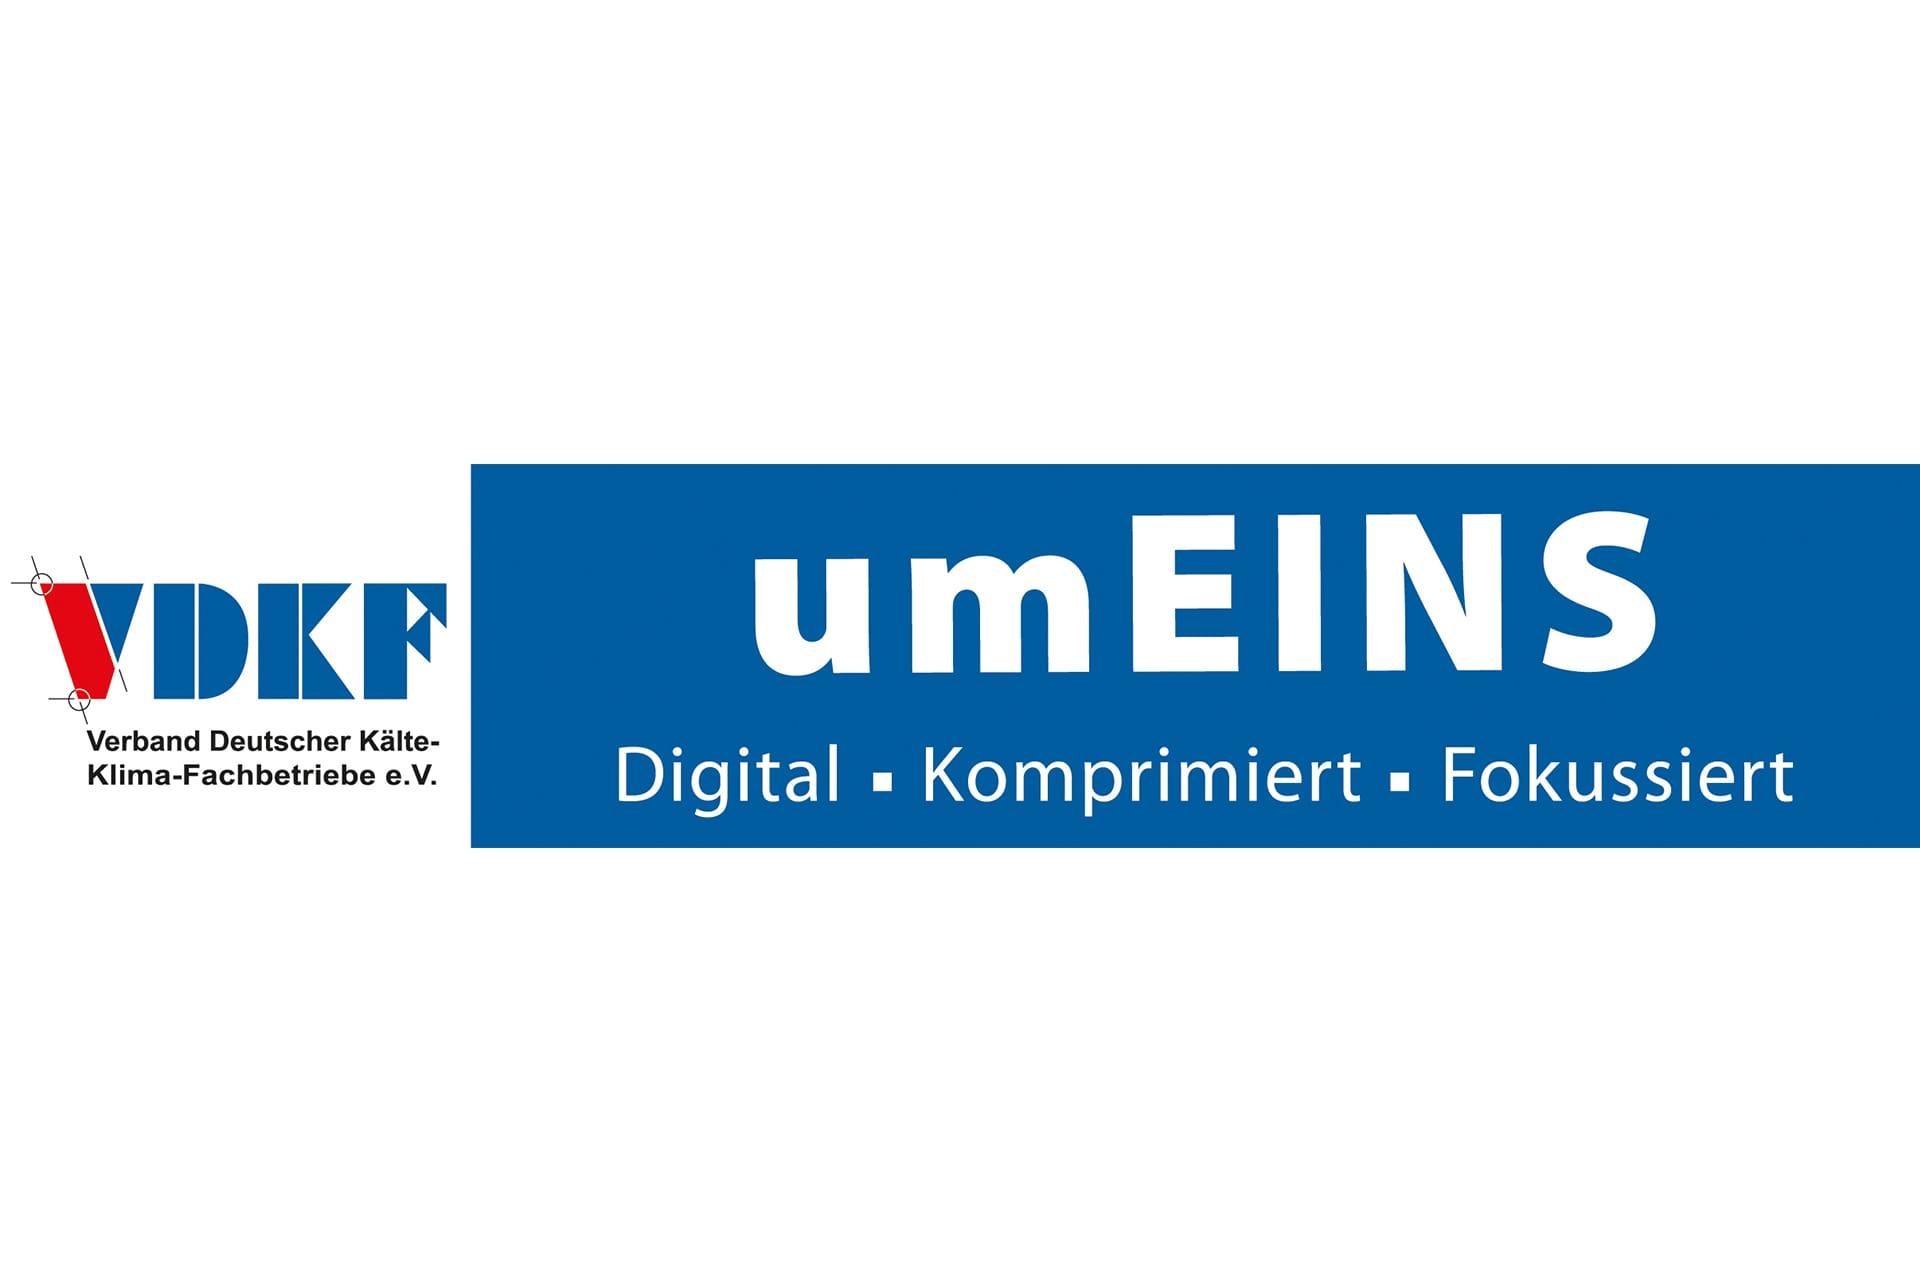 VDKF um Eins: Digital, komprimiert, fokussiert